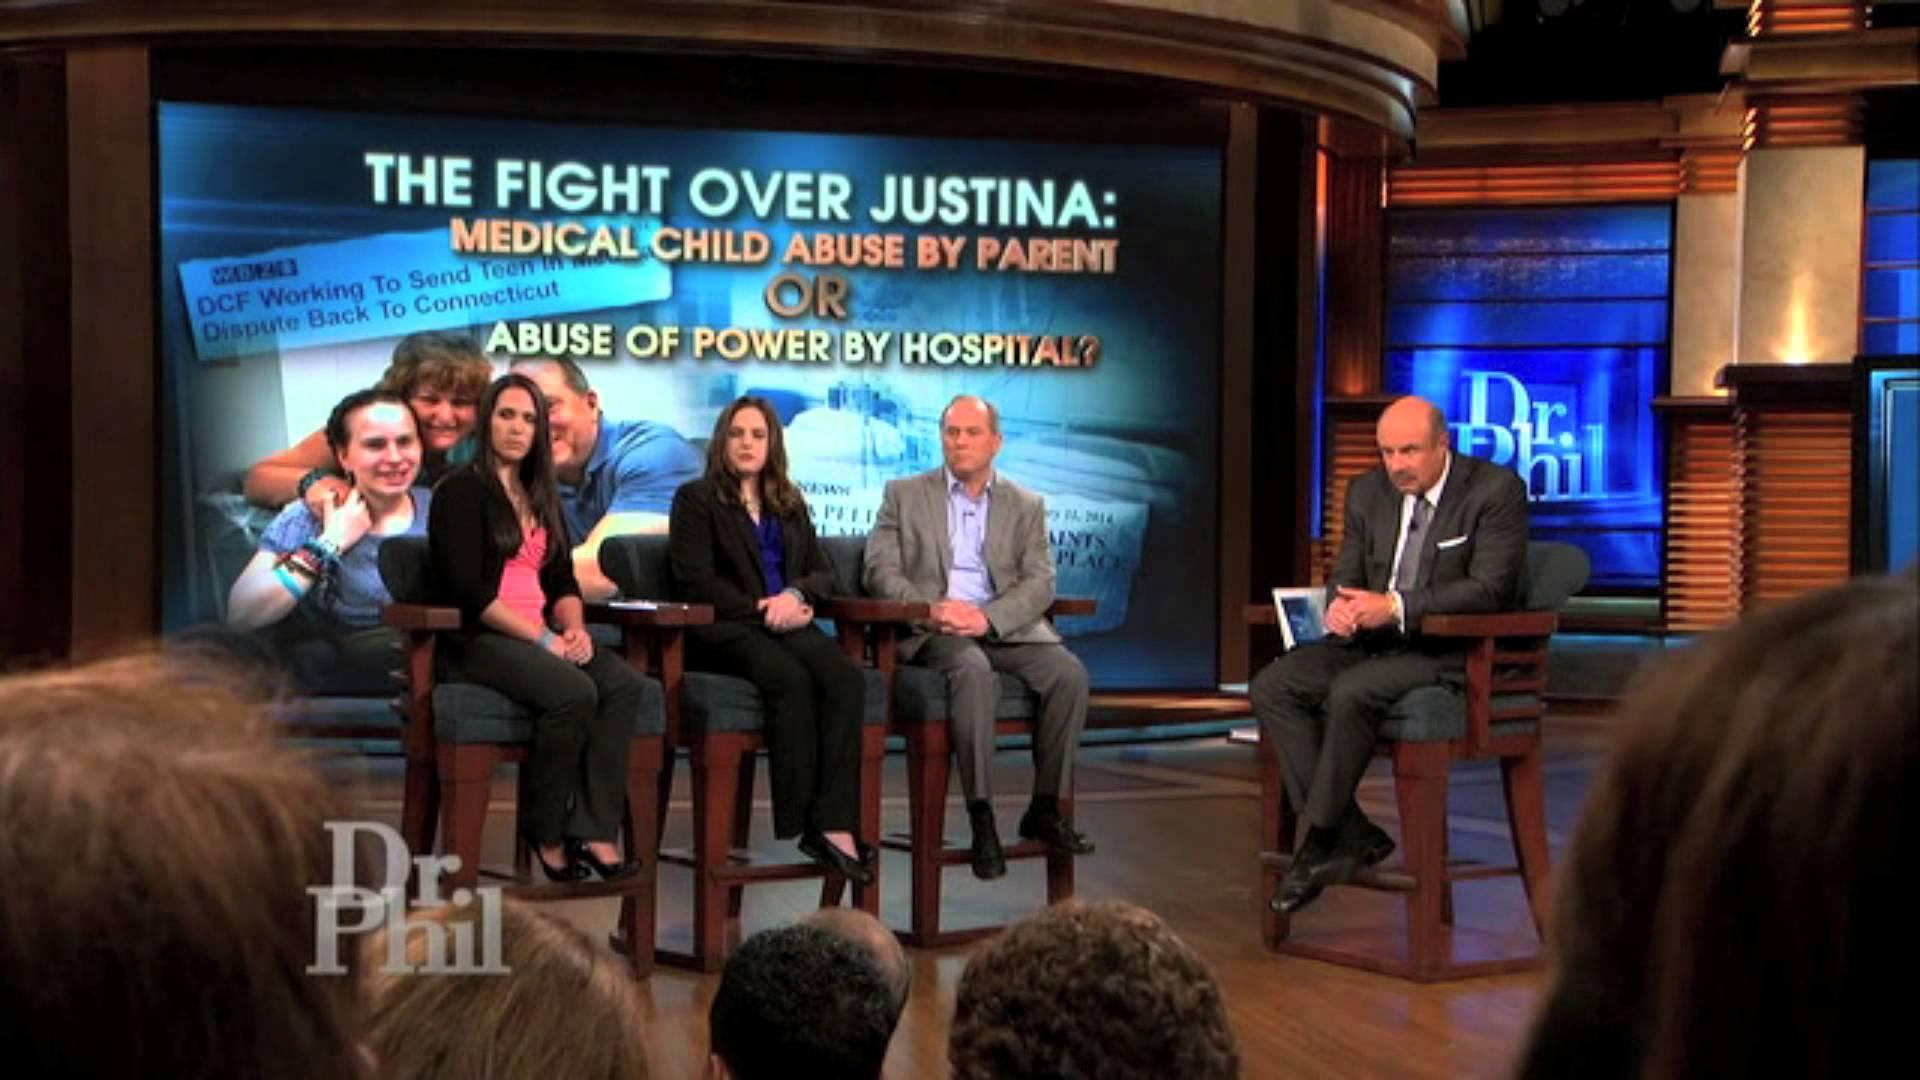 Justina Pelletier Finally Leaves Boston Children's Hospital, but not Returned to Parents